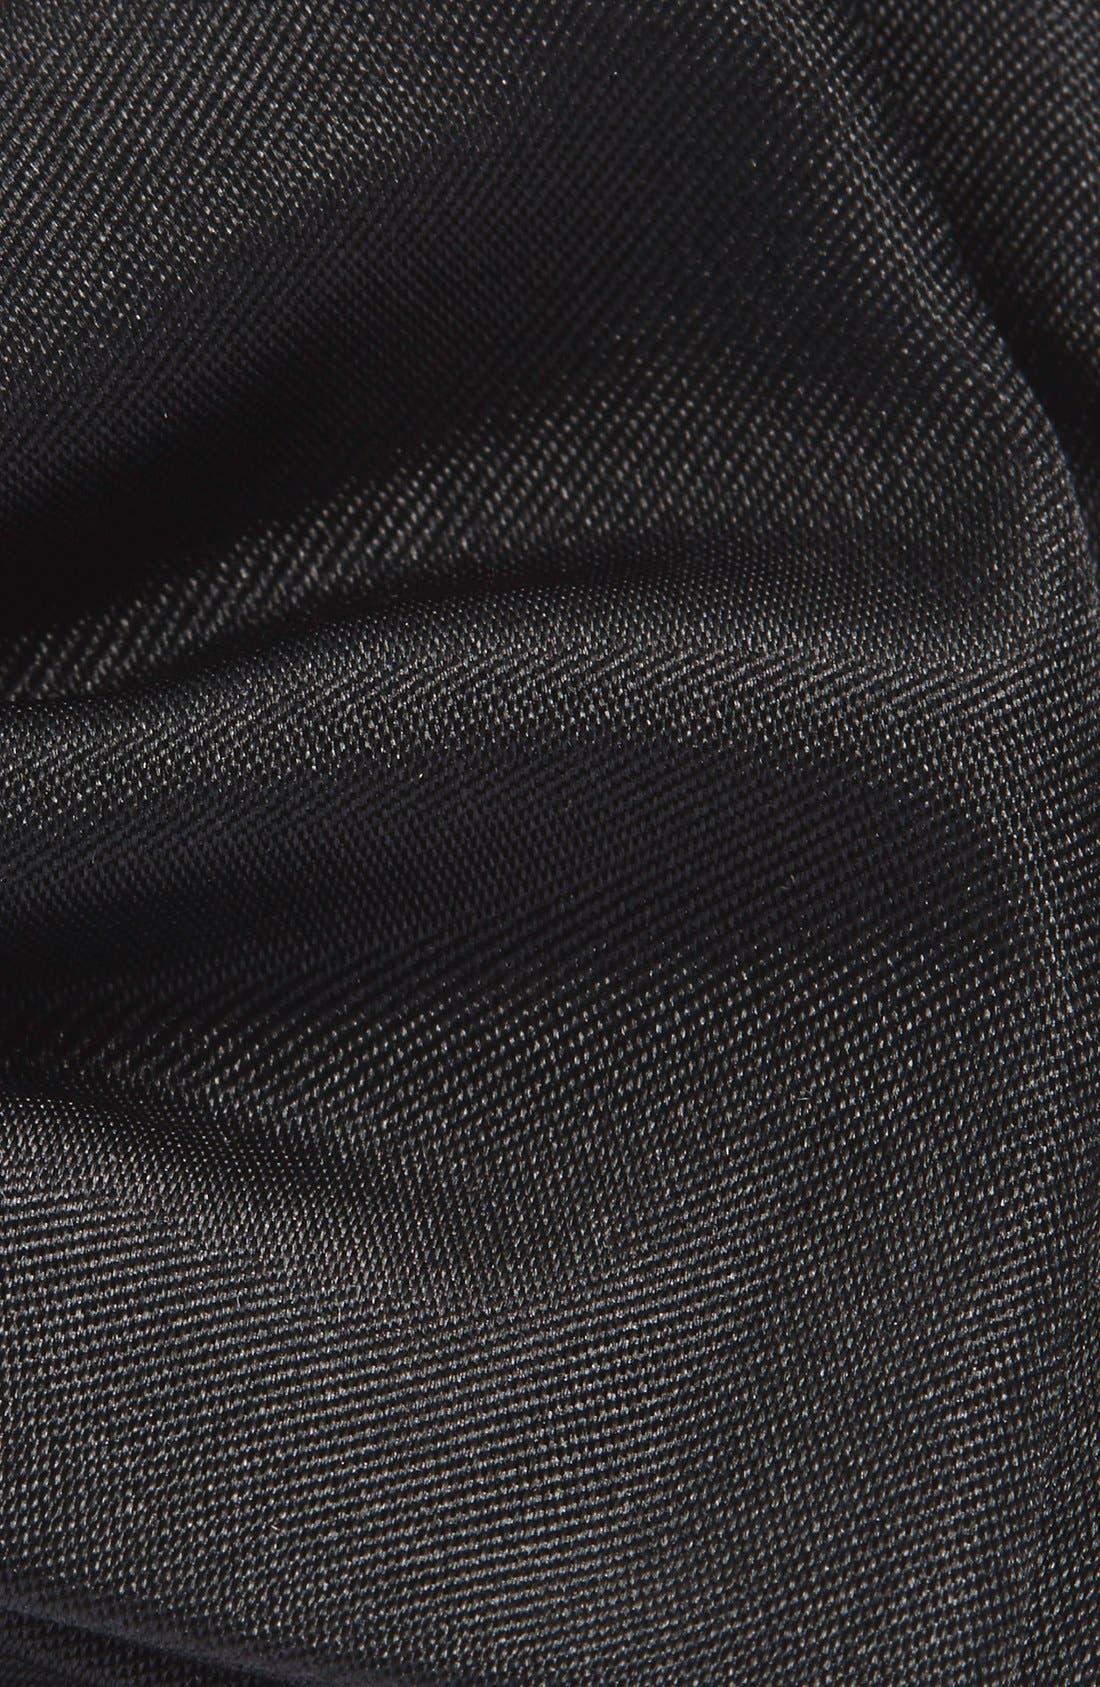 Silk Pre-Tied Bow Tie,                             Alternate thumbnail 2, color,                             001